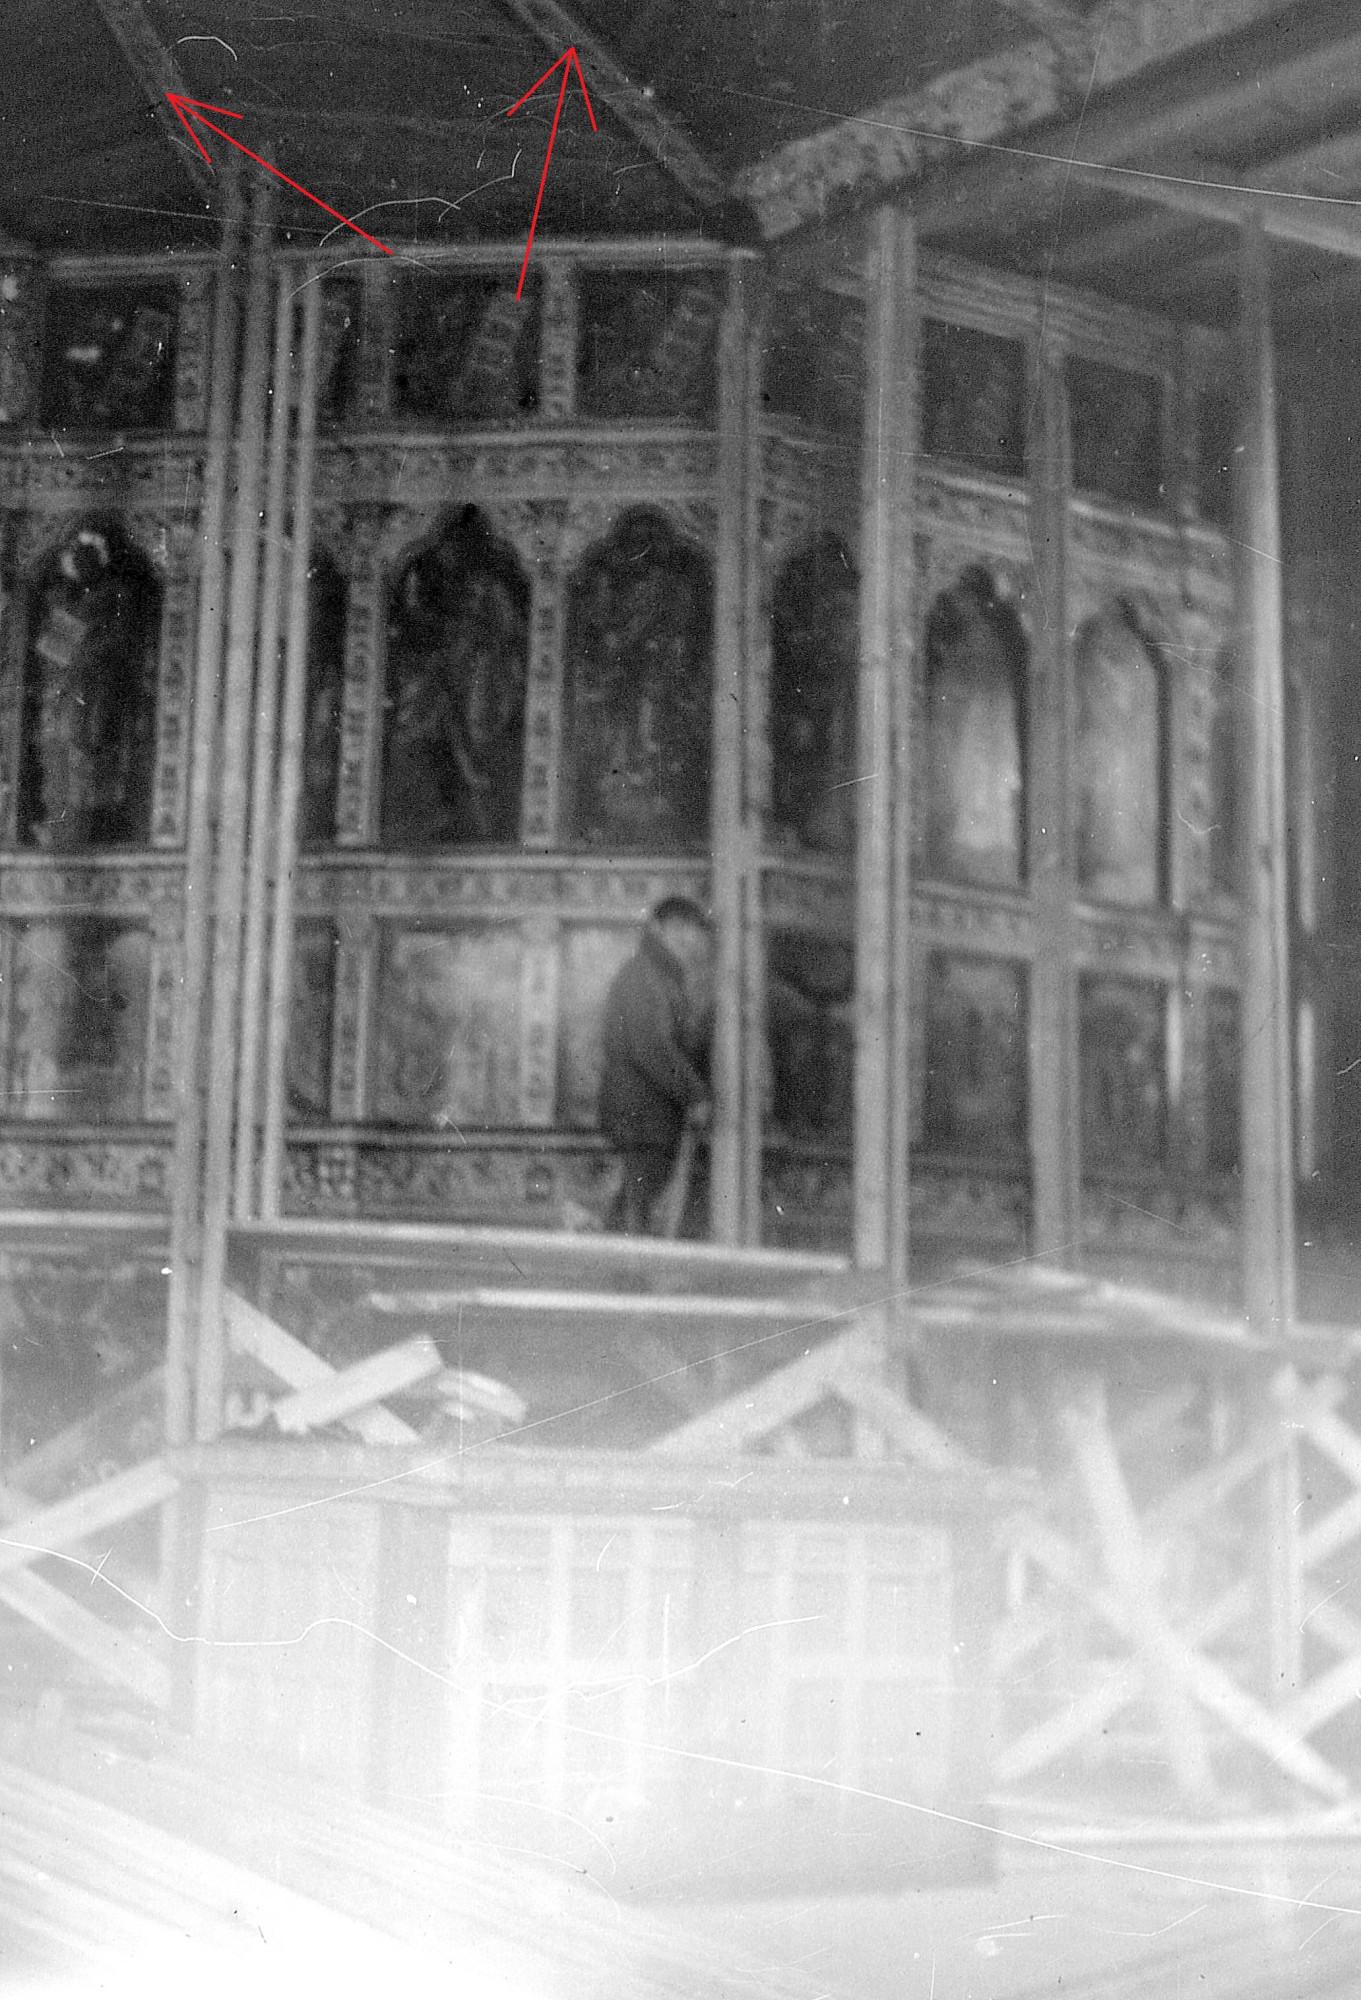 Разборка иконостаса, 1980. Тябла неба на своих местах.